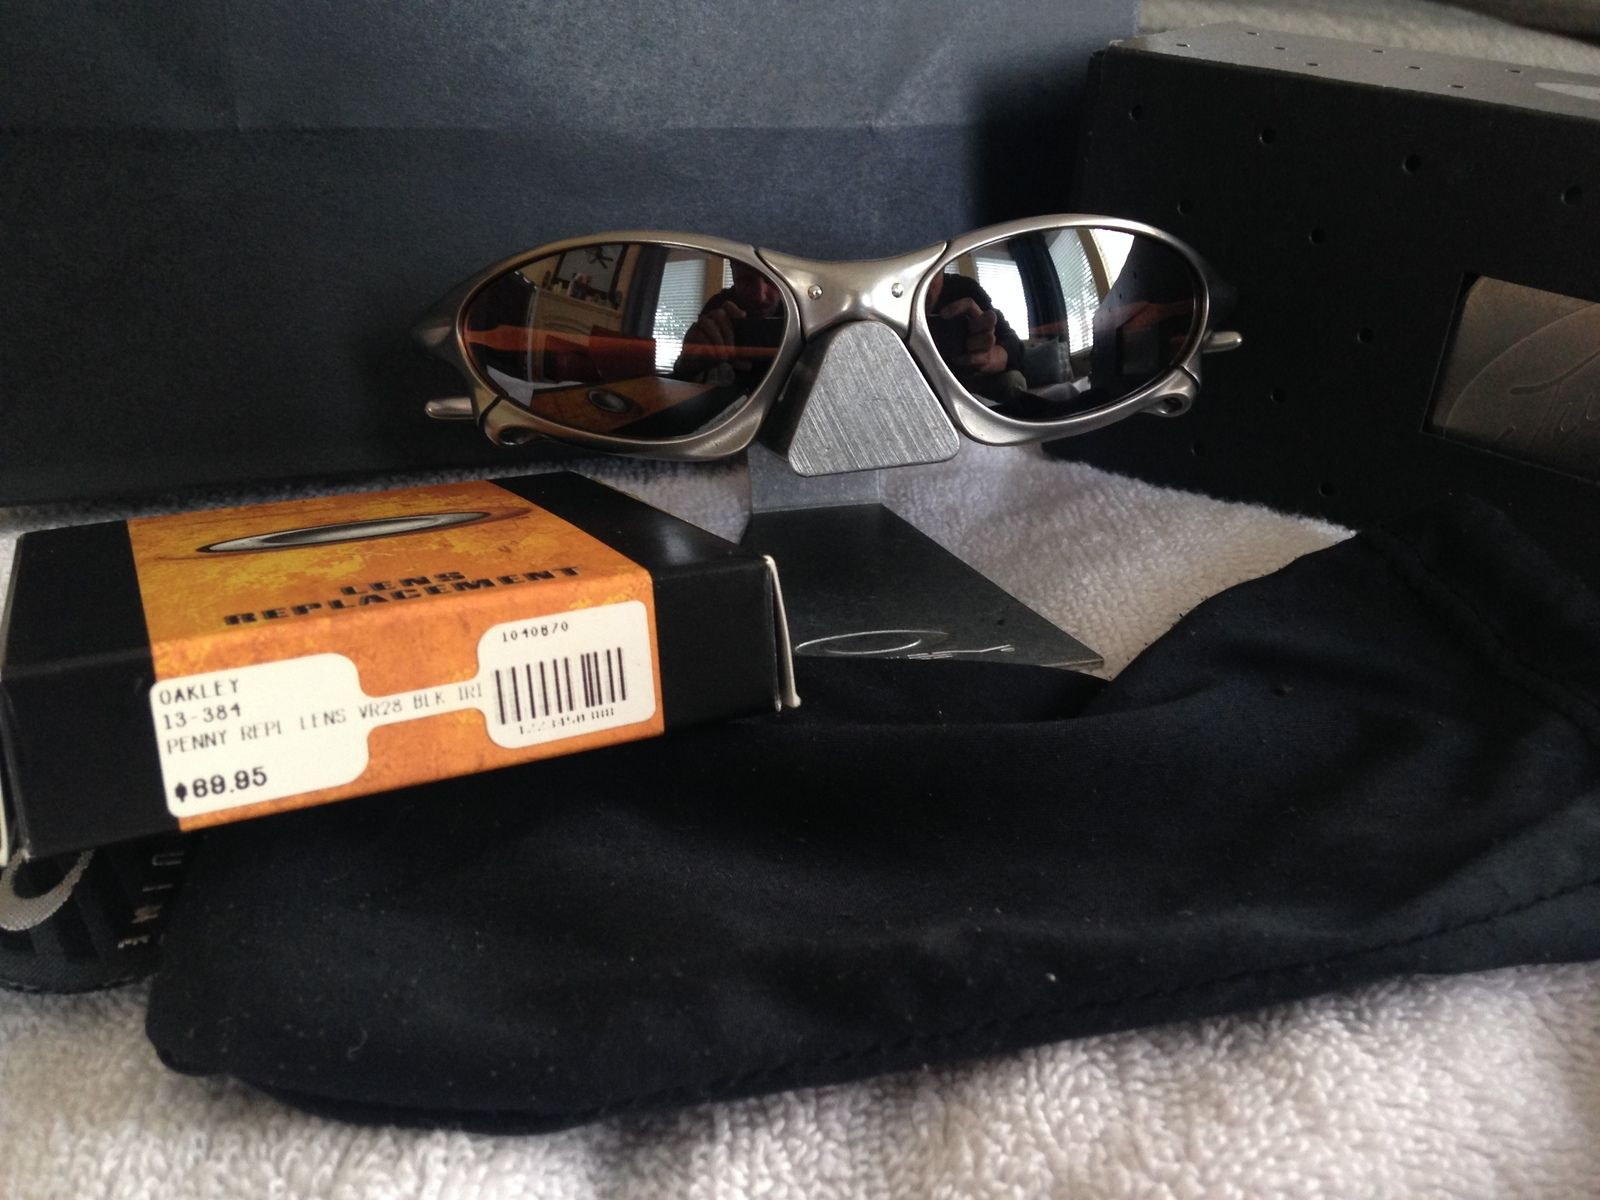 Penny Titanium w/ VR28 and Ice Iridium + bonus $350 - XCyTQKX.jpg